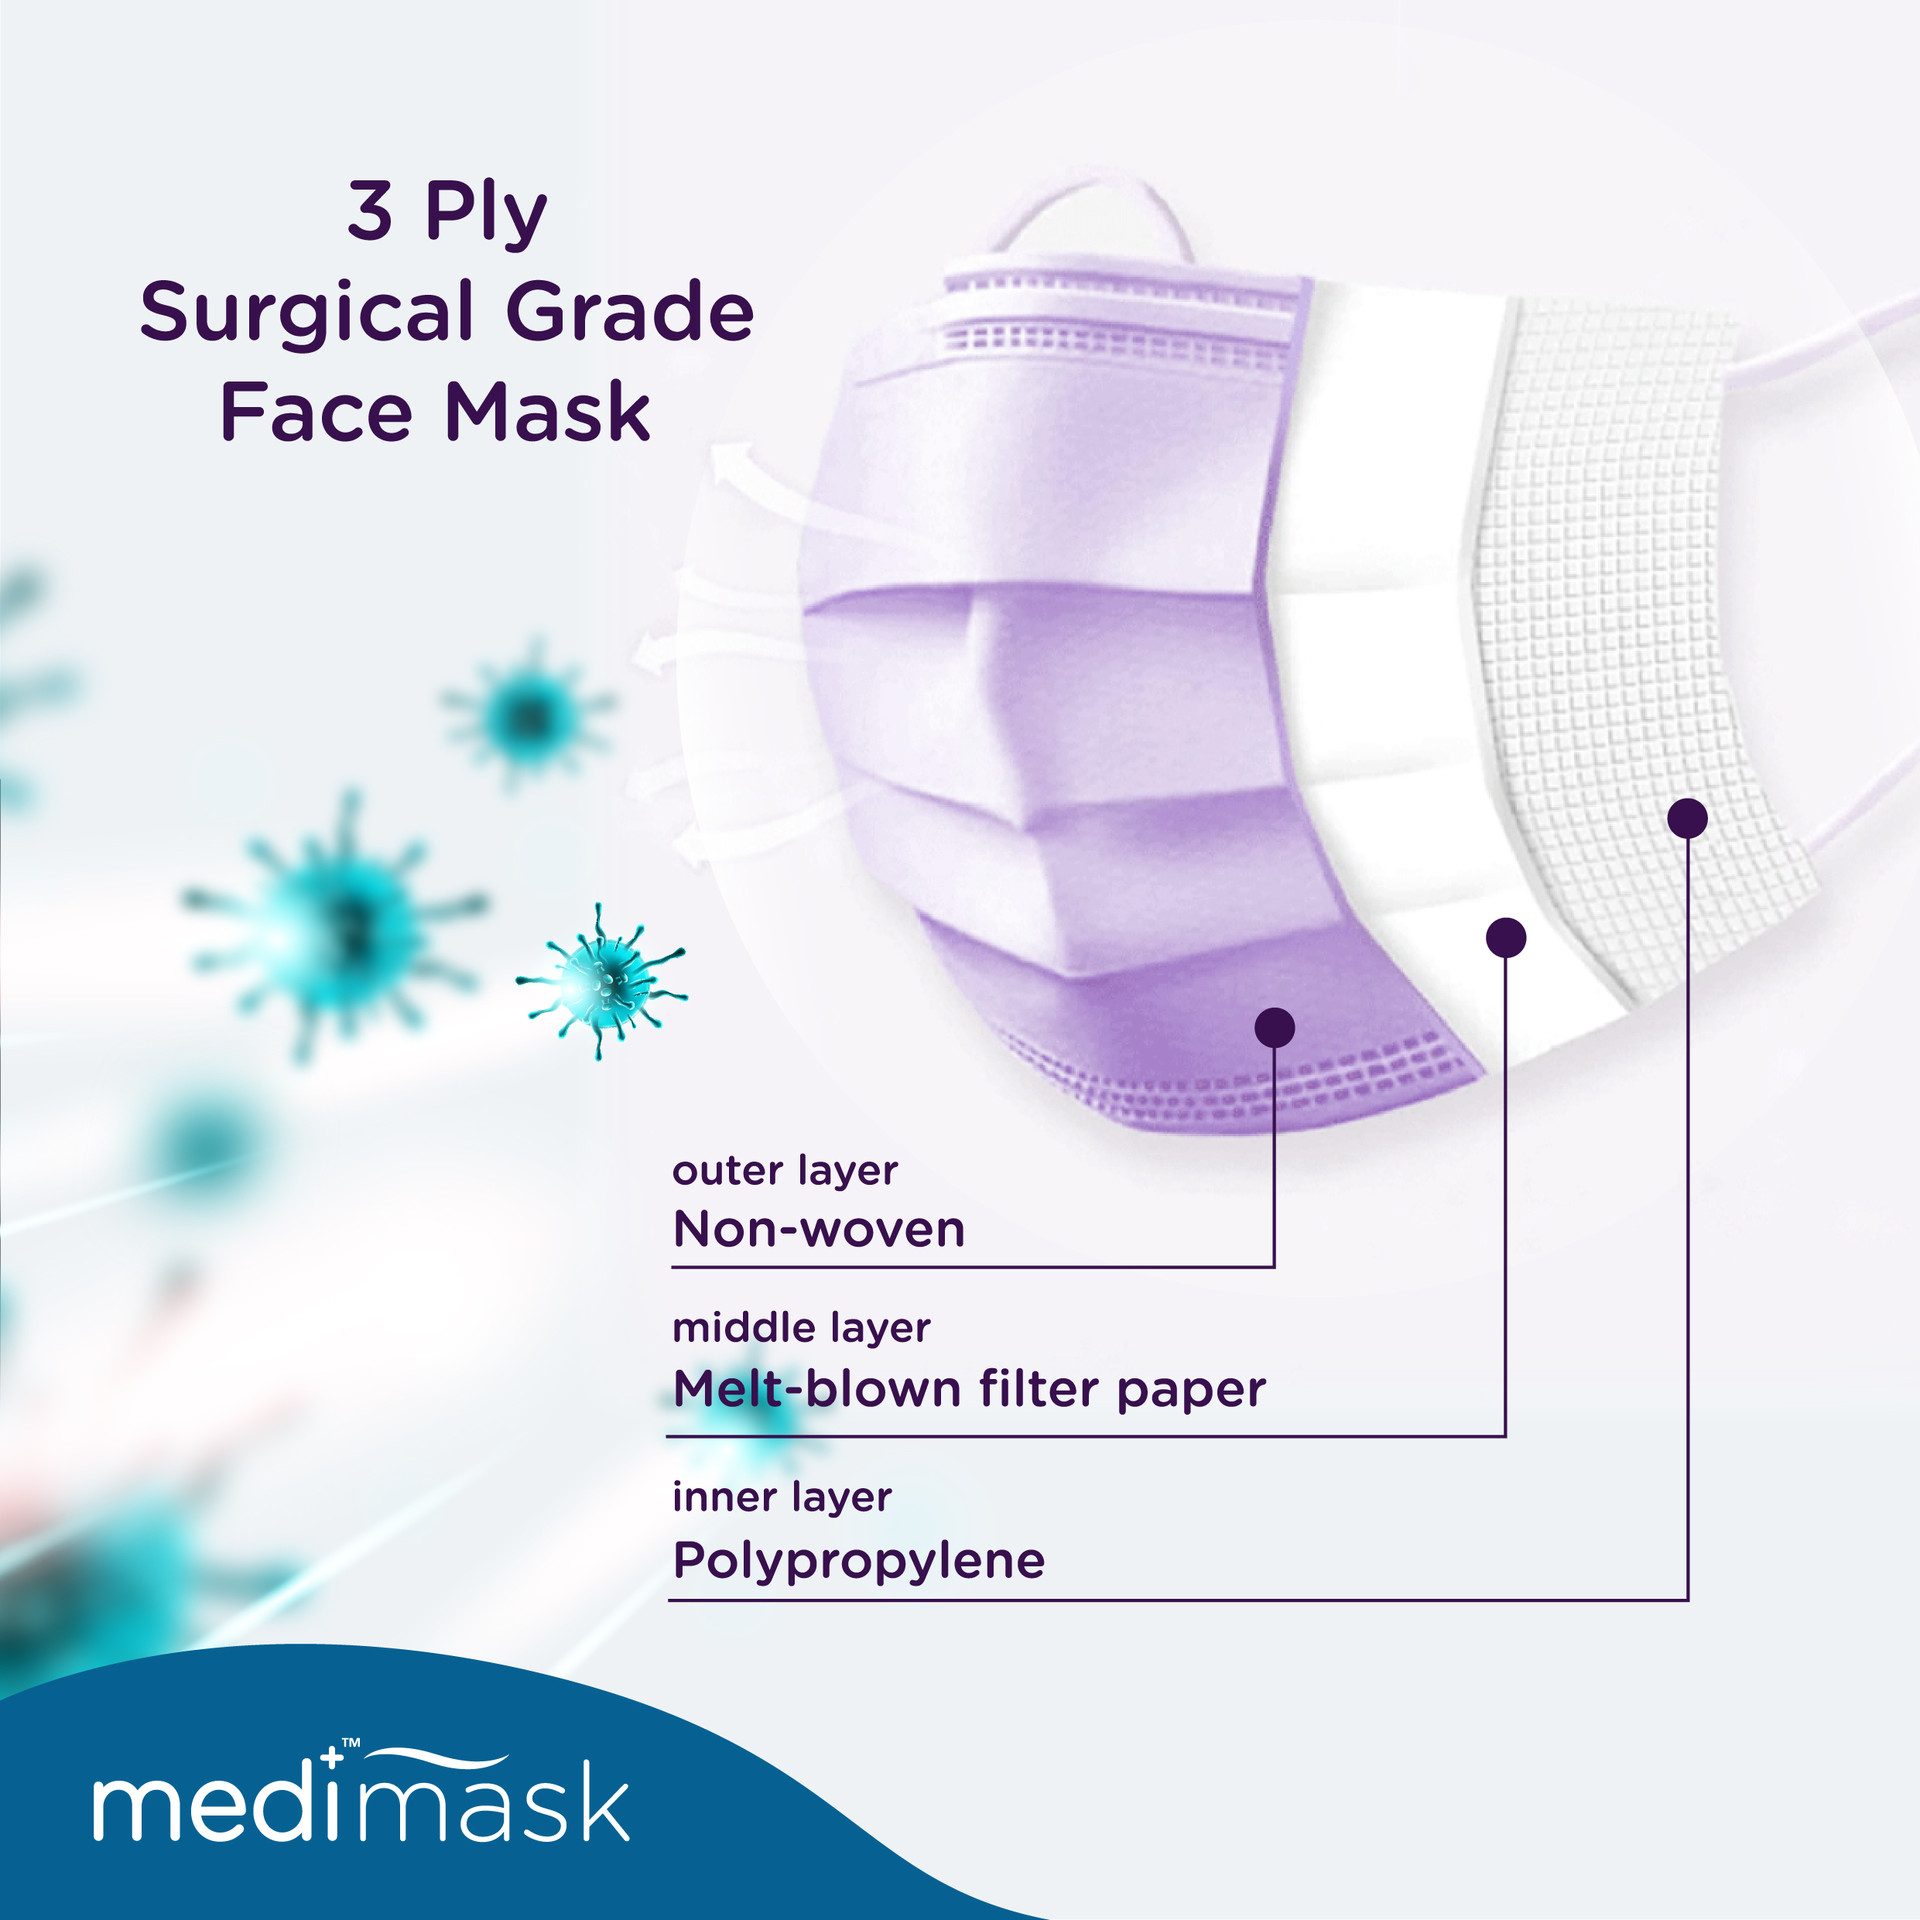 medimask 98 type 2 purple_POSM-02.jpg